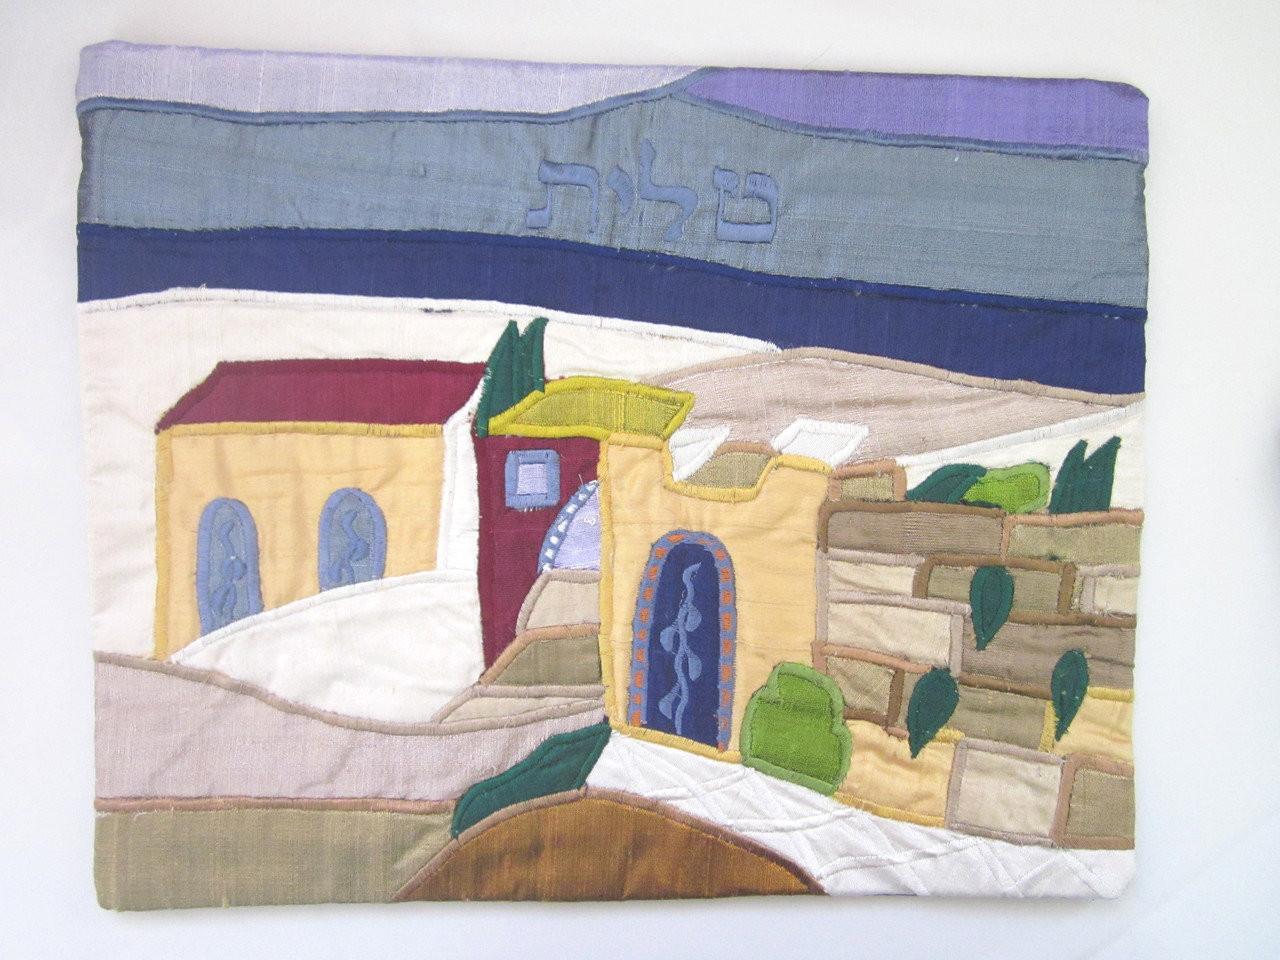 Western Wall Tallit Bag